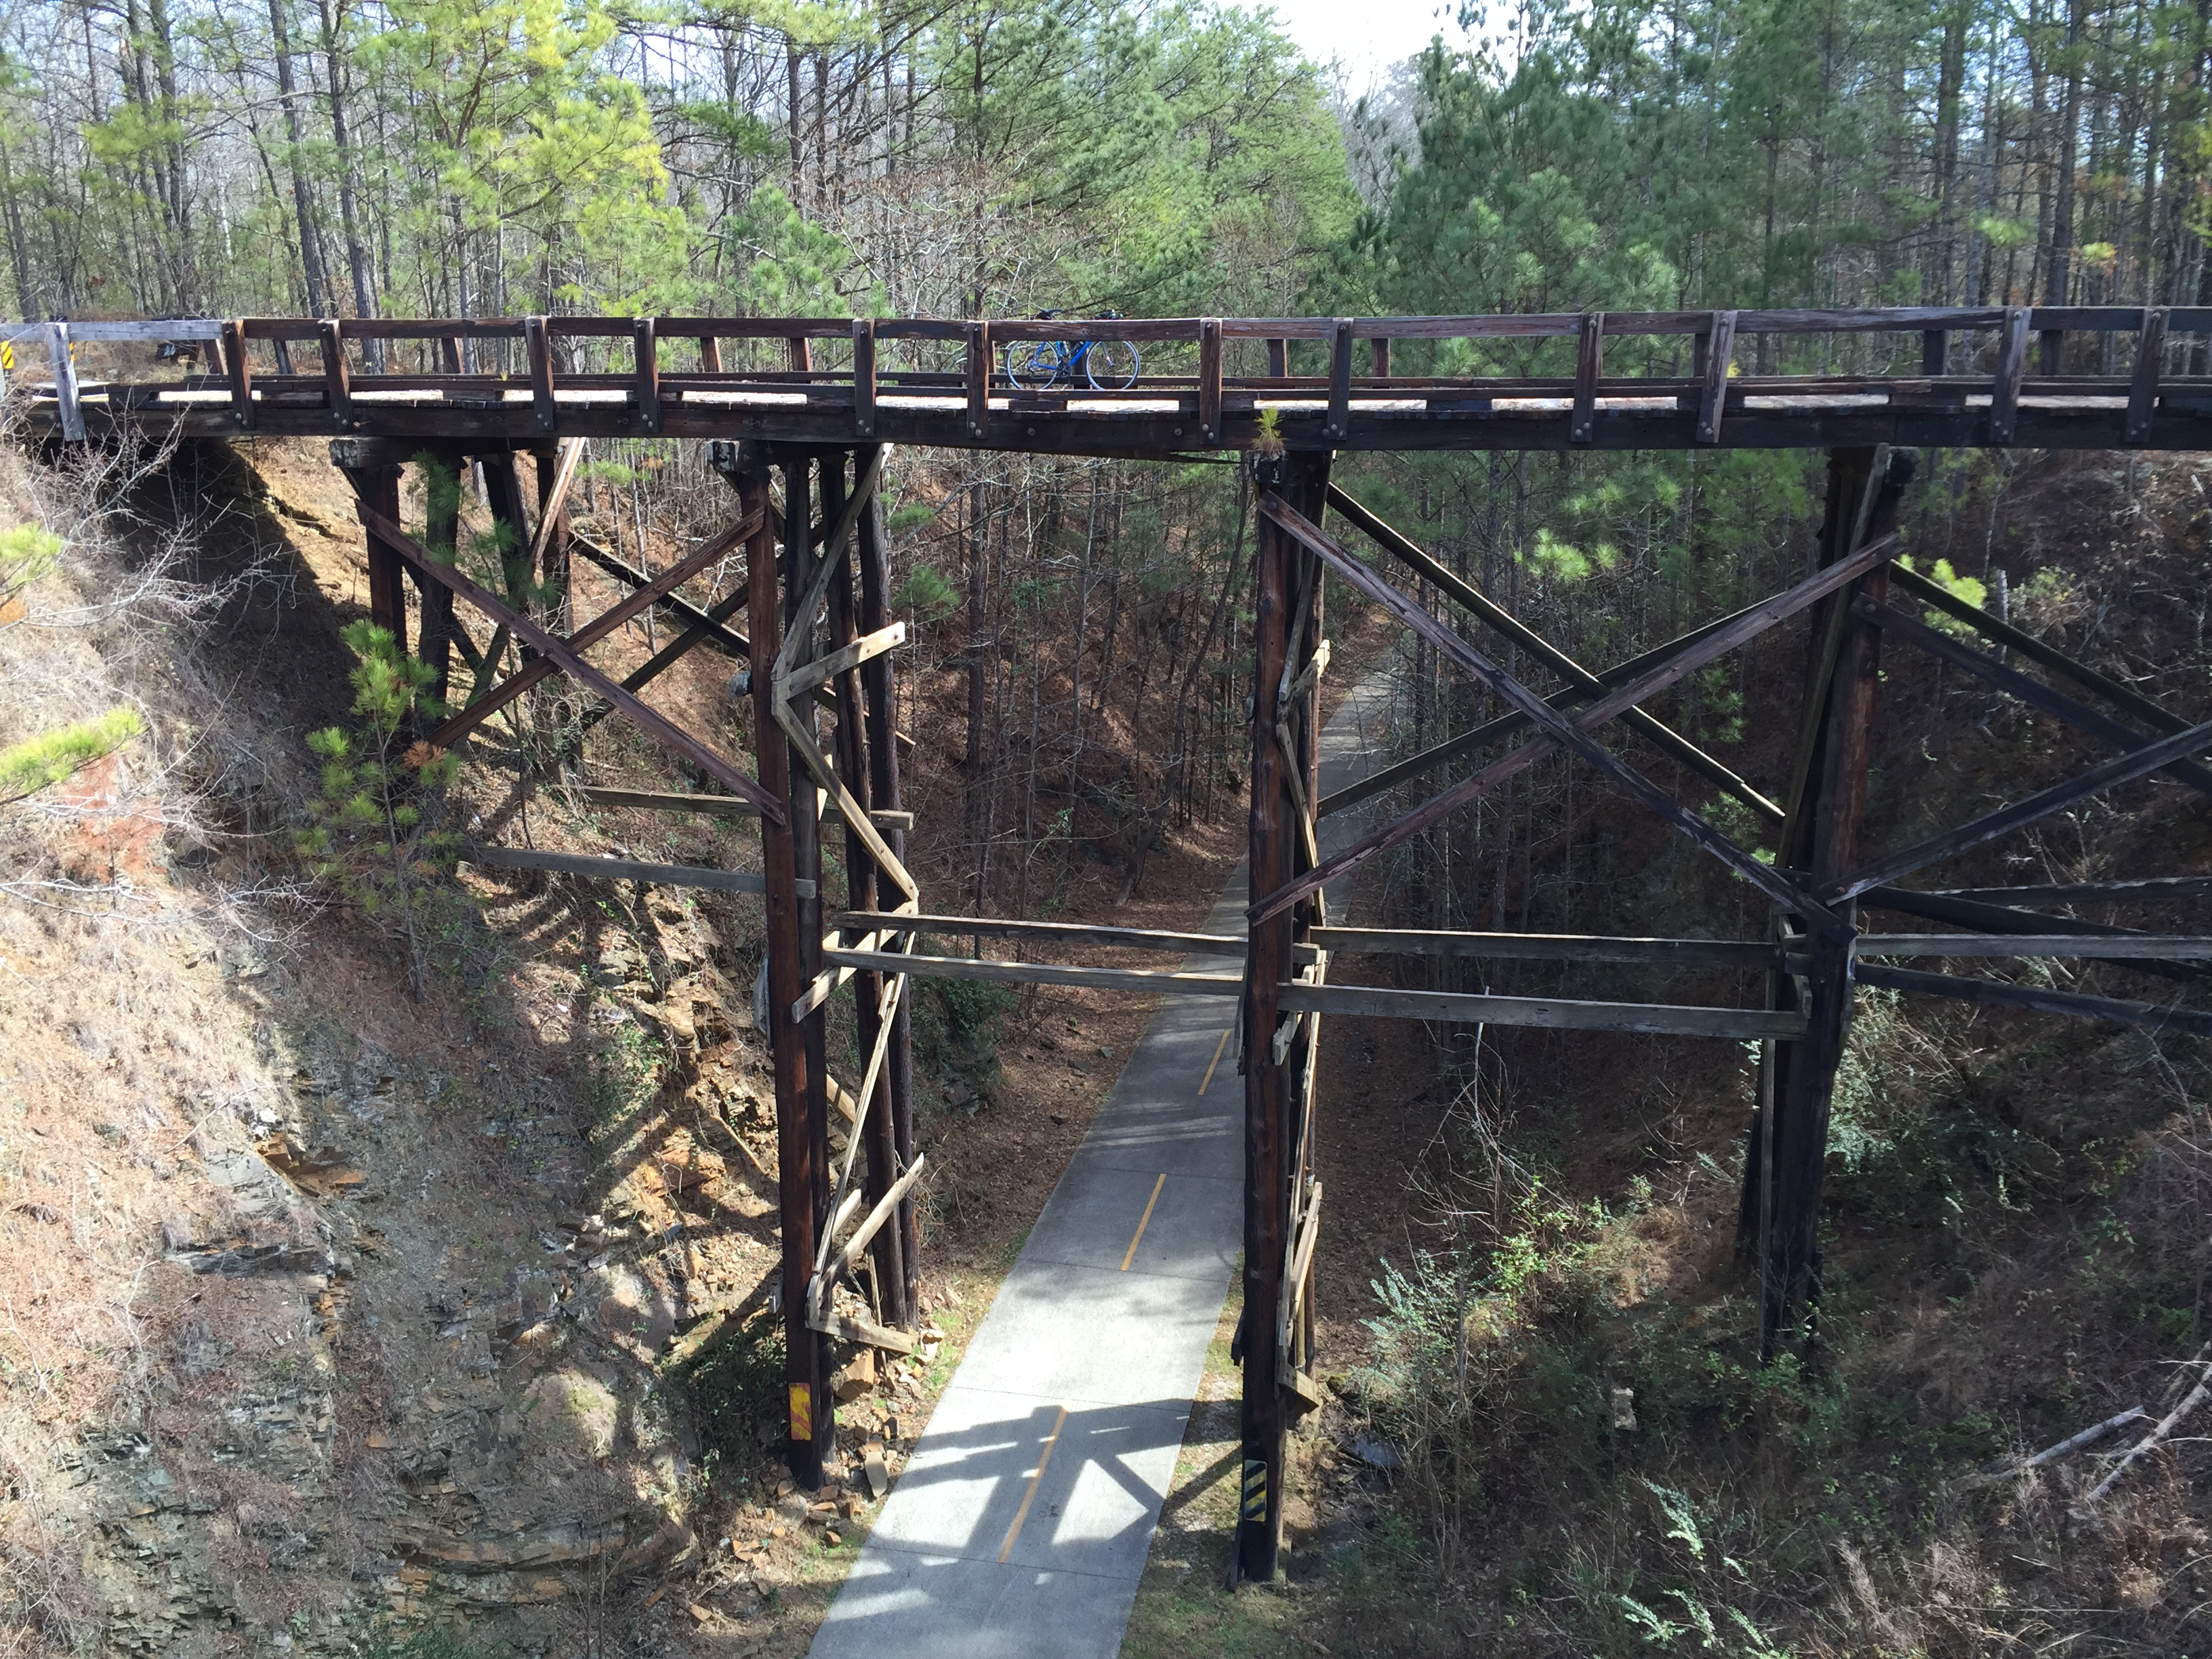 Willow Springs Bridge